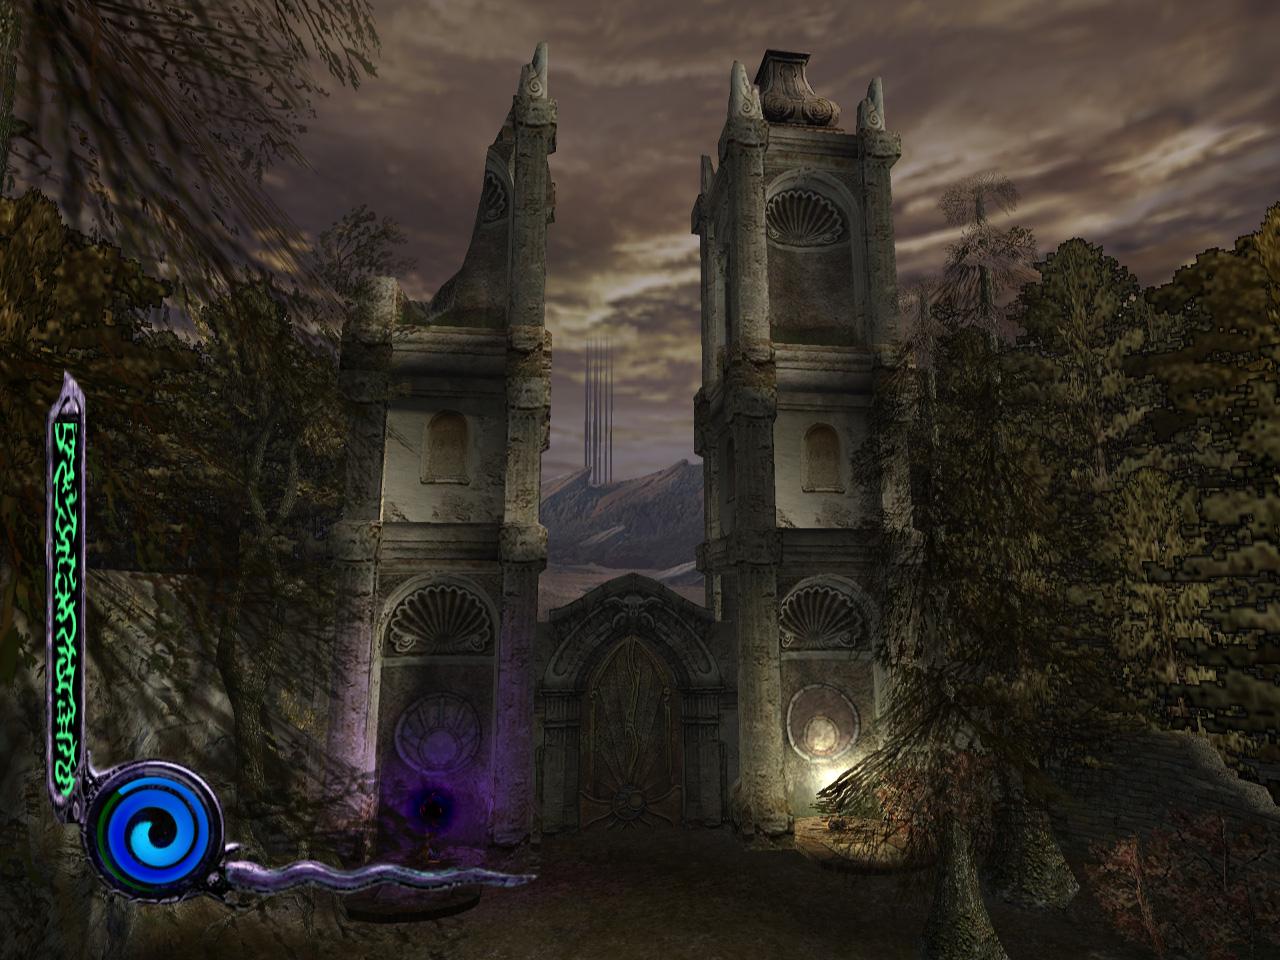 Def-Cemetery-Dark-LightGate-Pillars.jpg